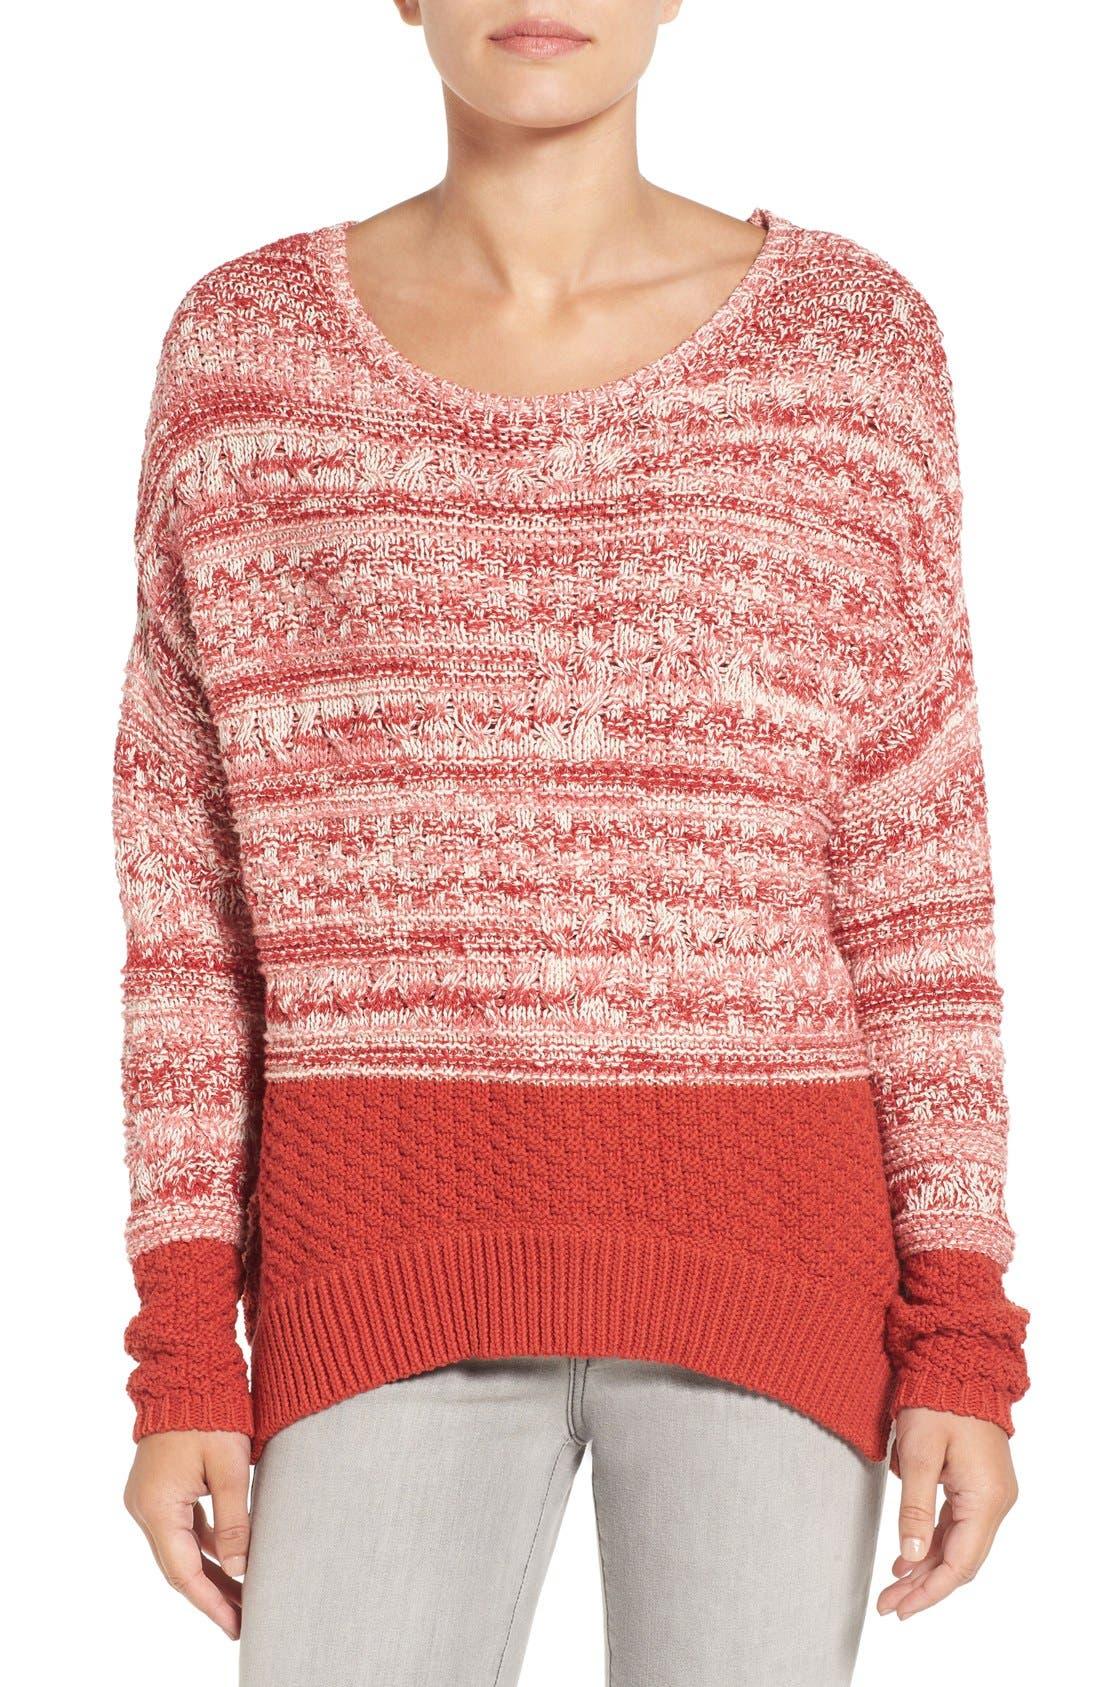 Main Image - Caslon® Colorblock Marl Knit Sweater